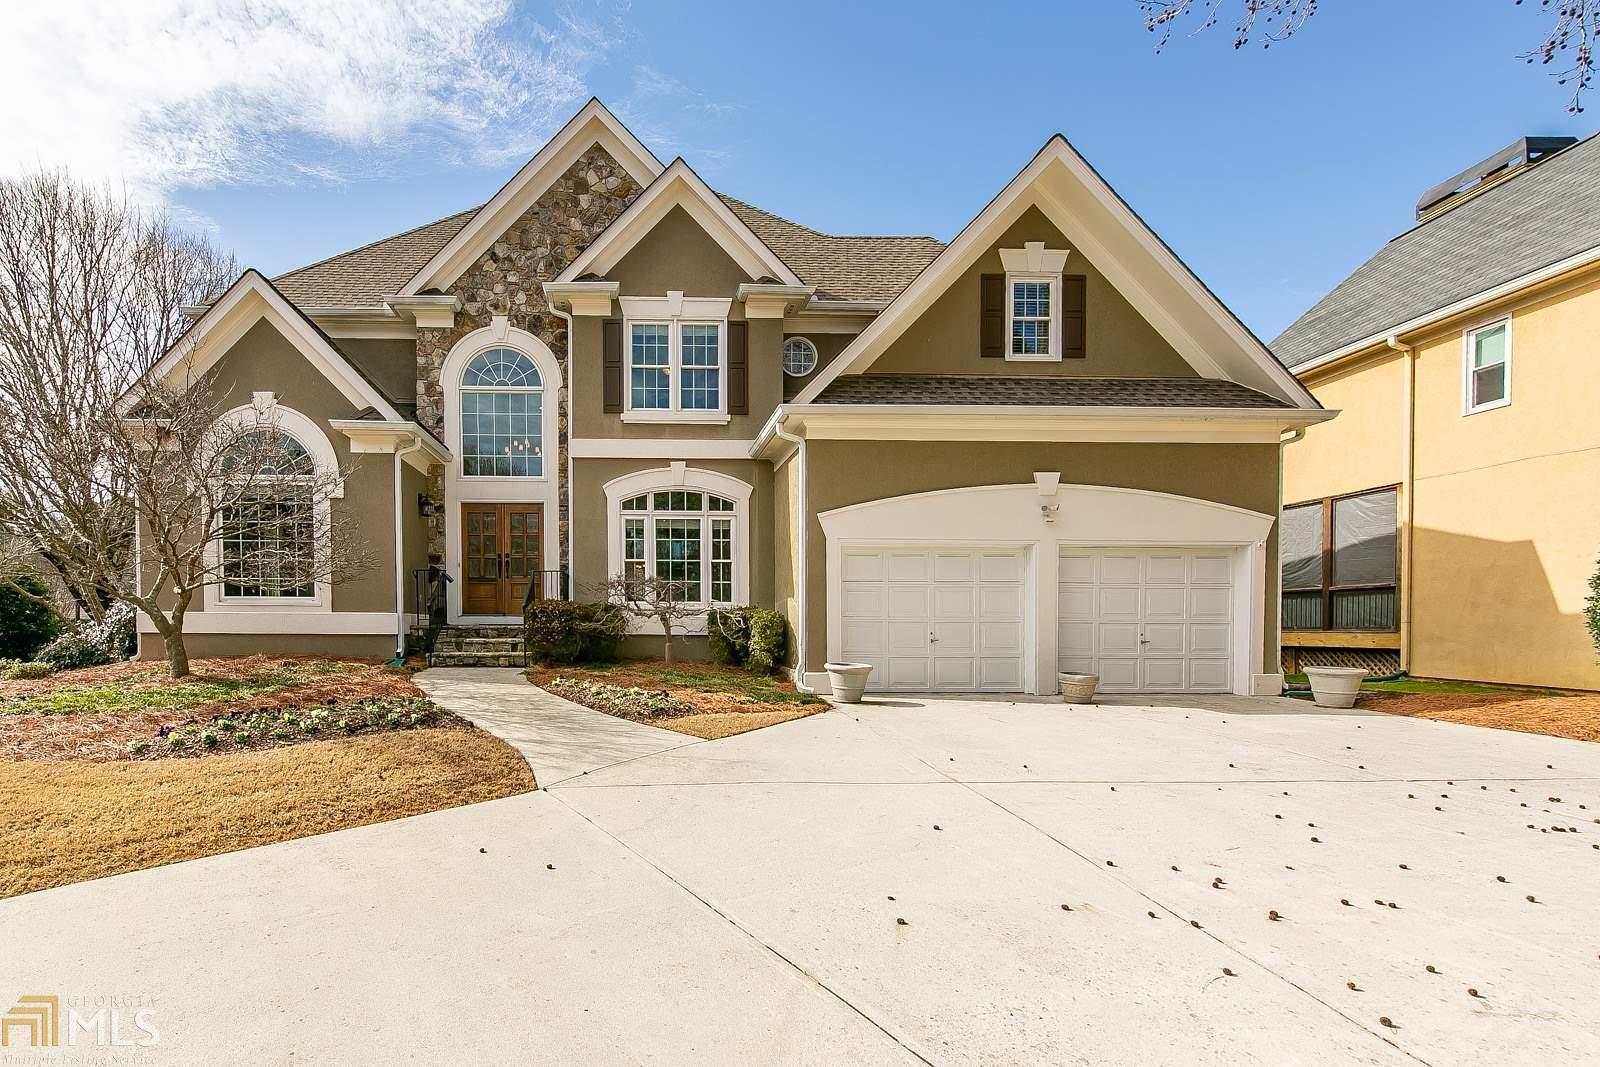 530 Brightmore Downs, Johns Creek, GA 30005 - #: 8917676